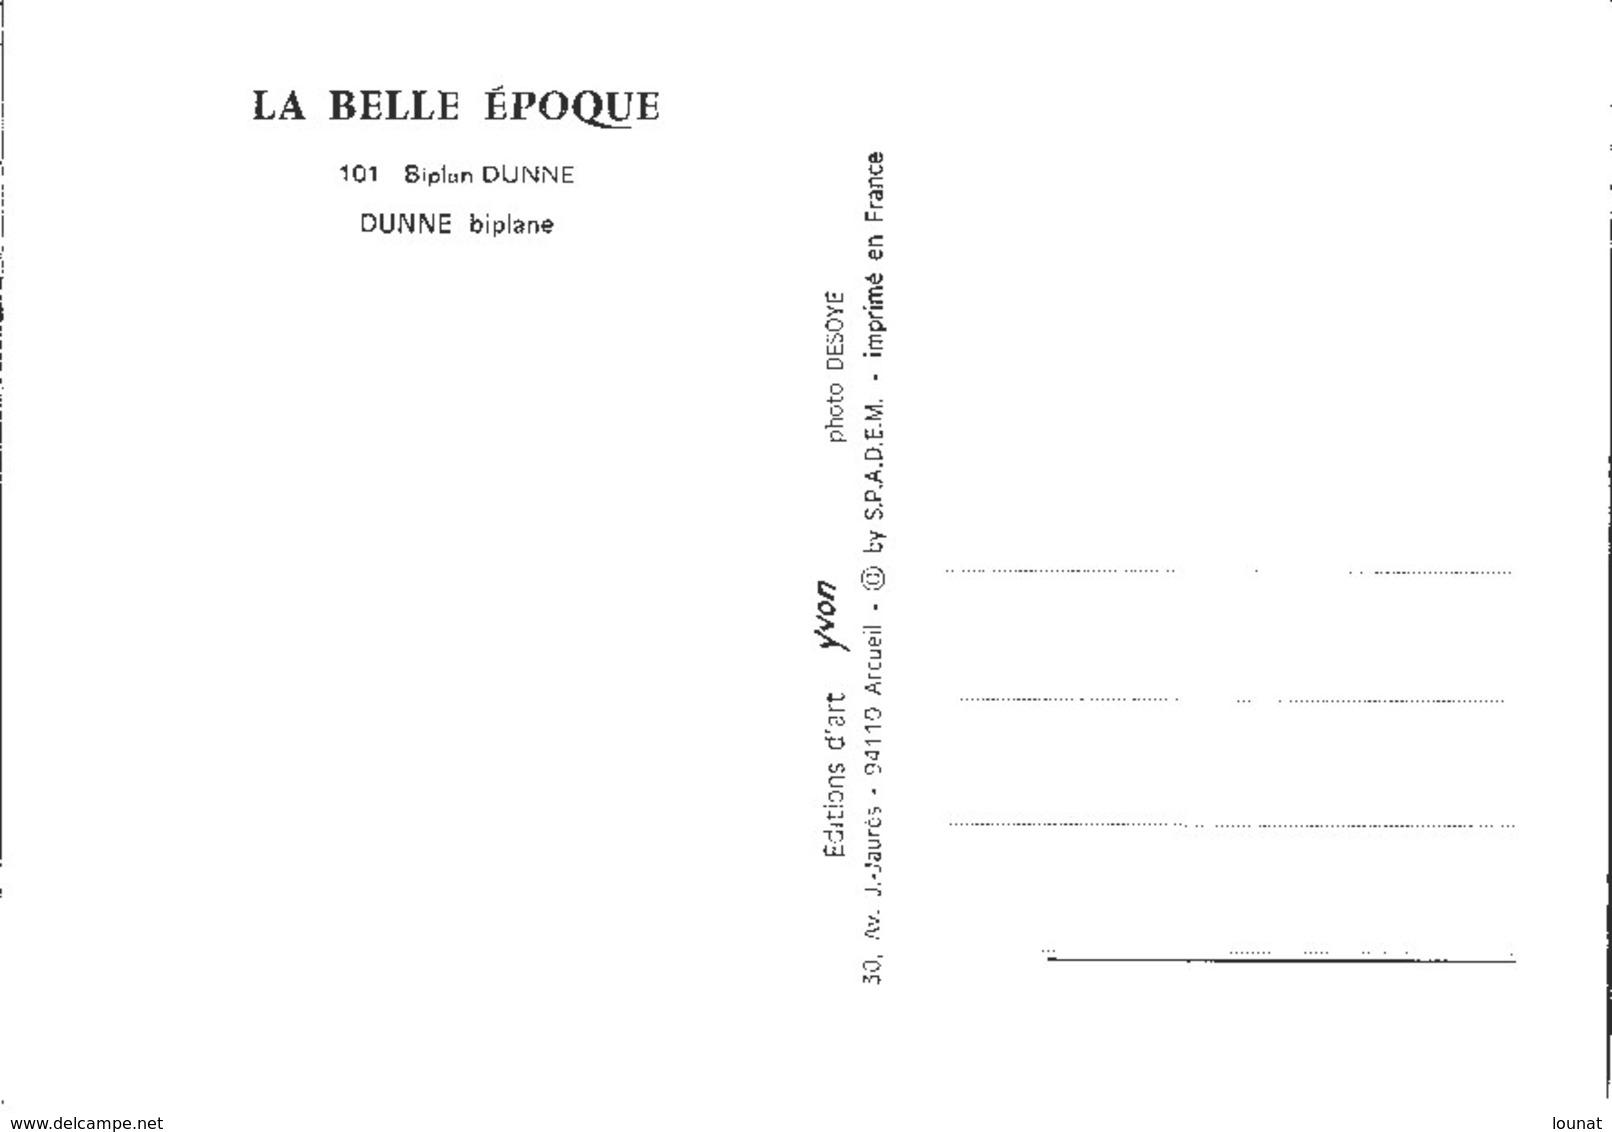 DUNNE Biplane - Biplan Dunne - Avions